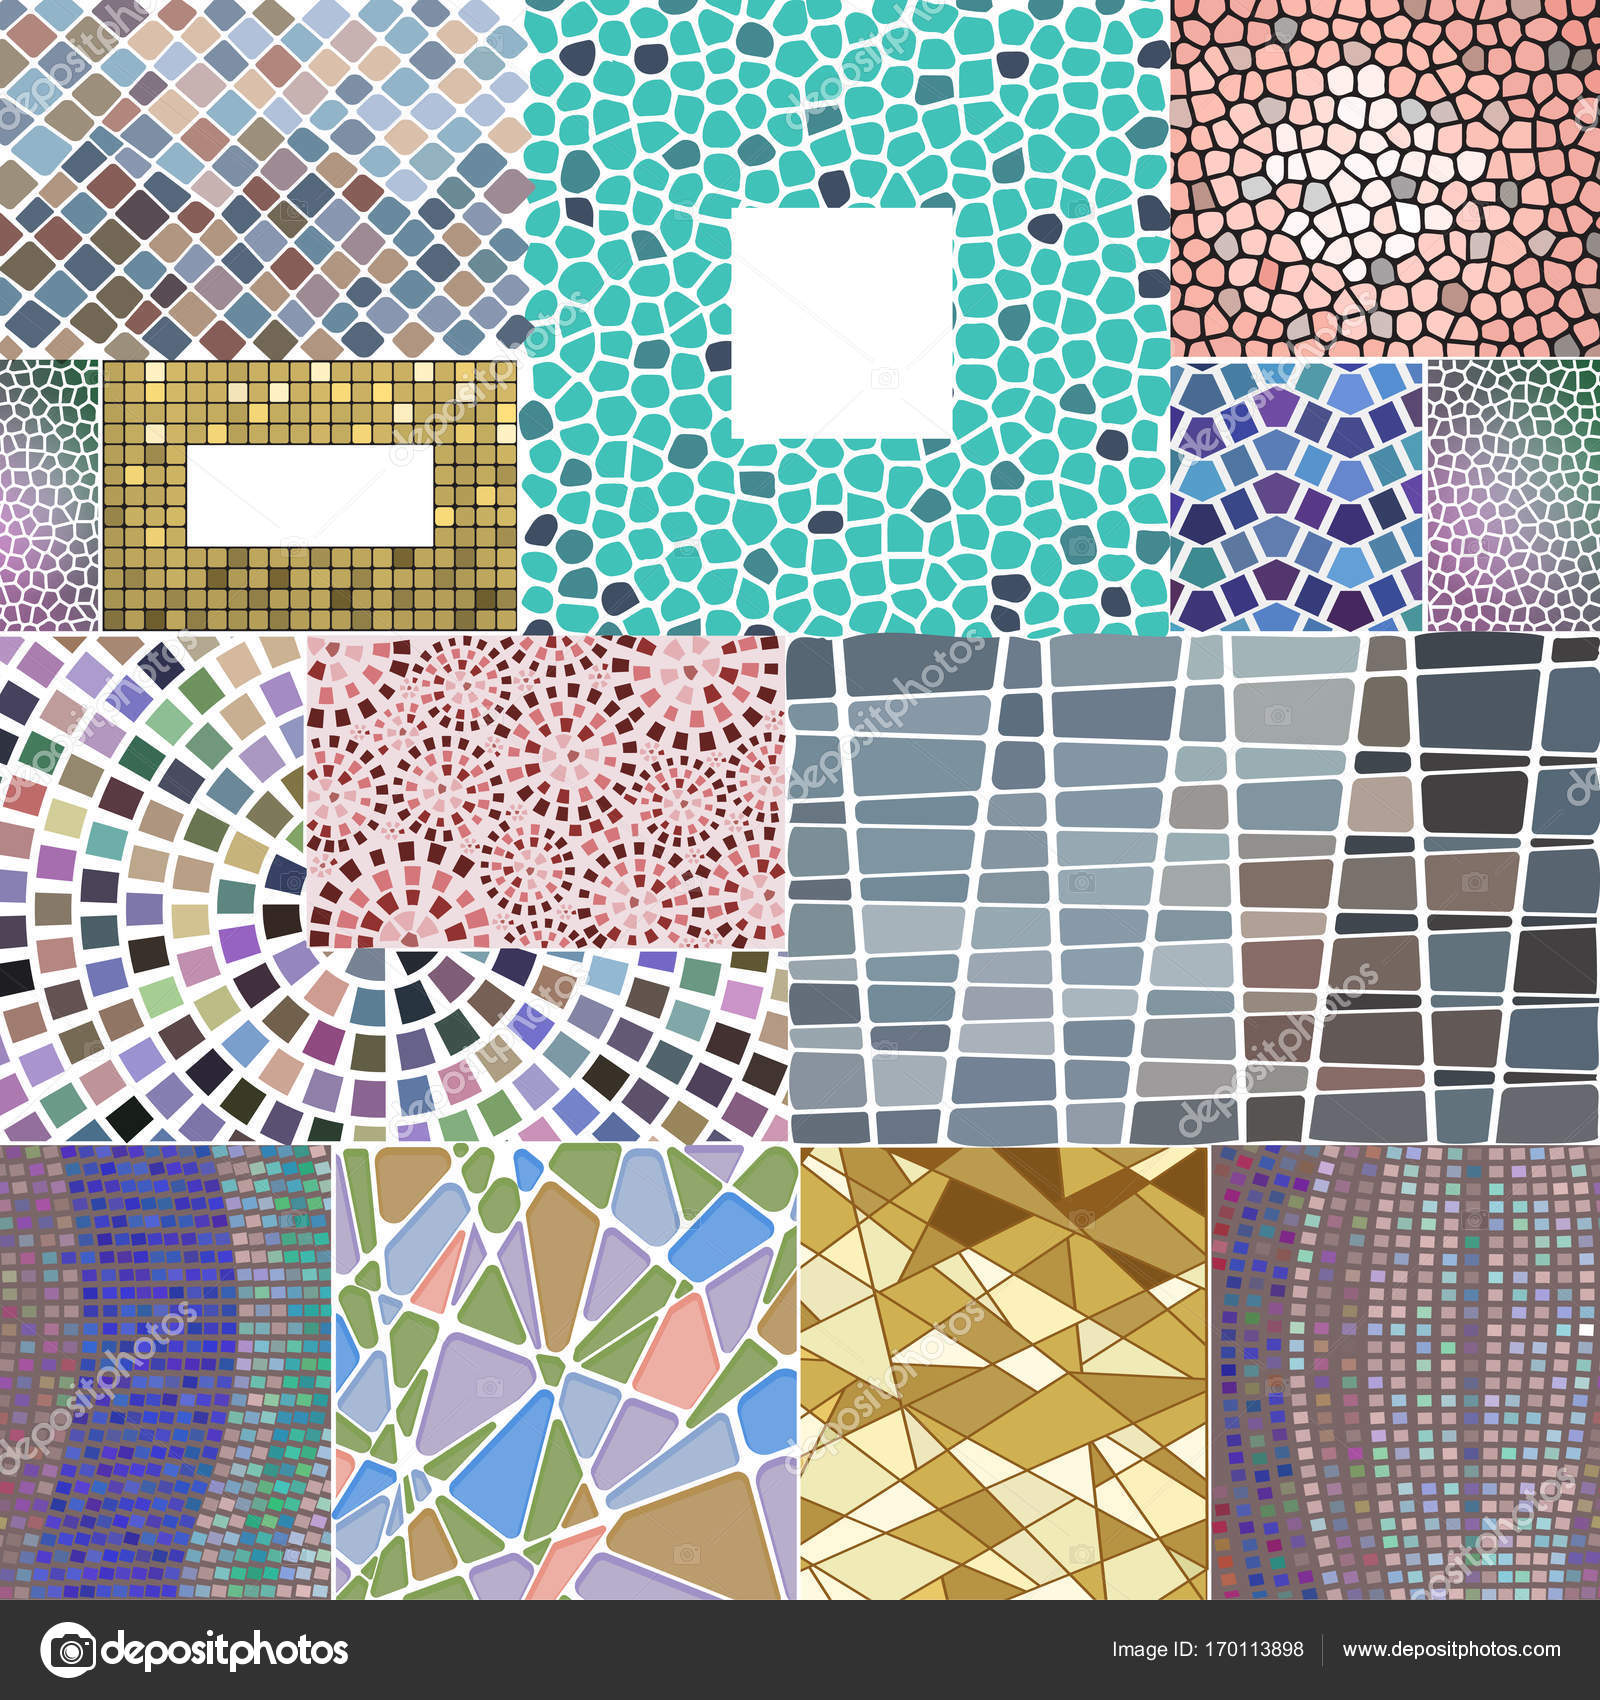 Mosaik Deko Rahmen Patchwork traditionelles Design geometrische ...